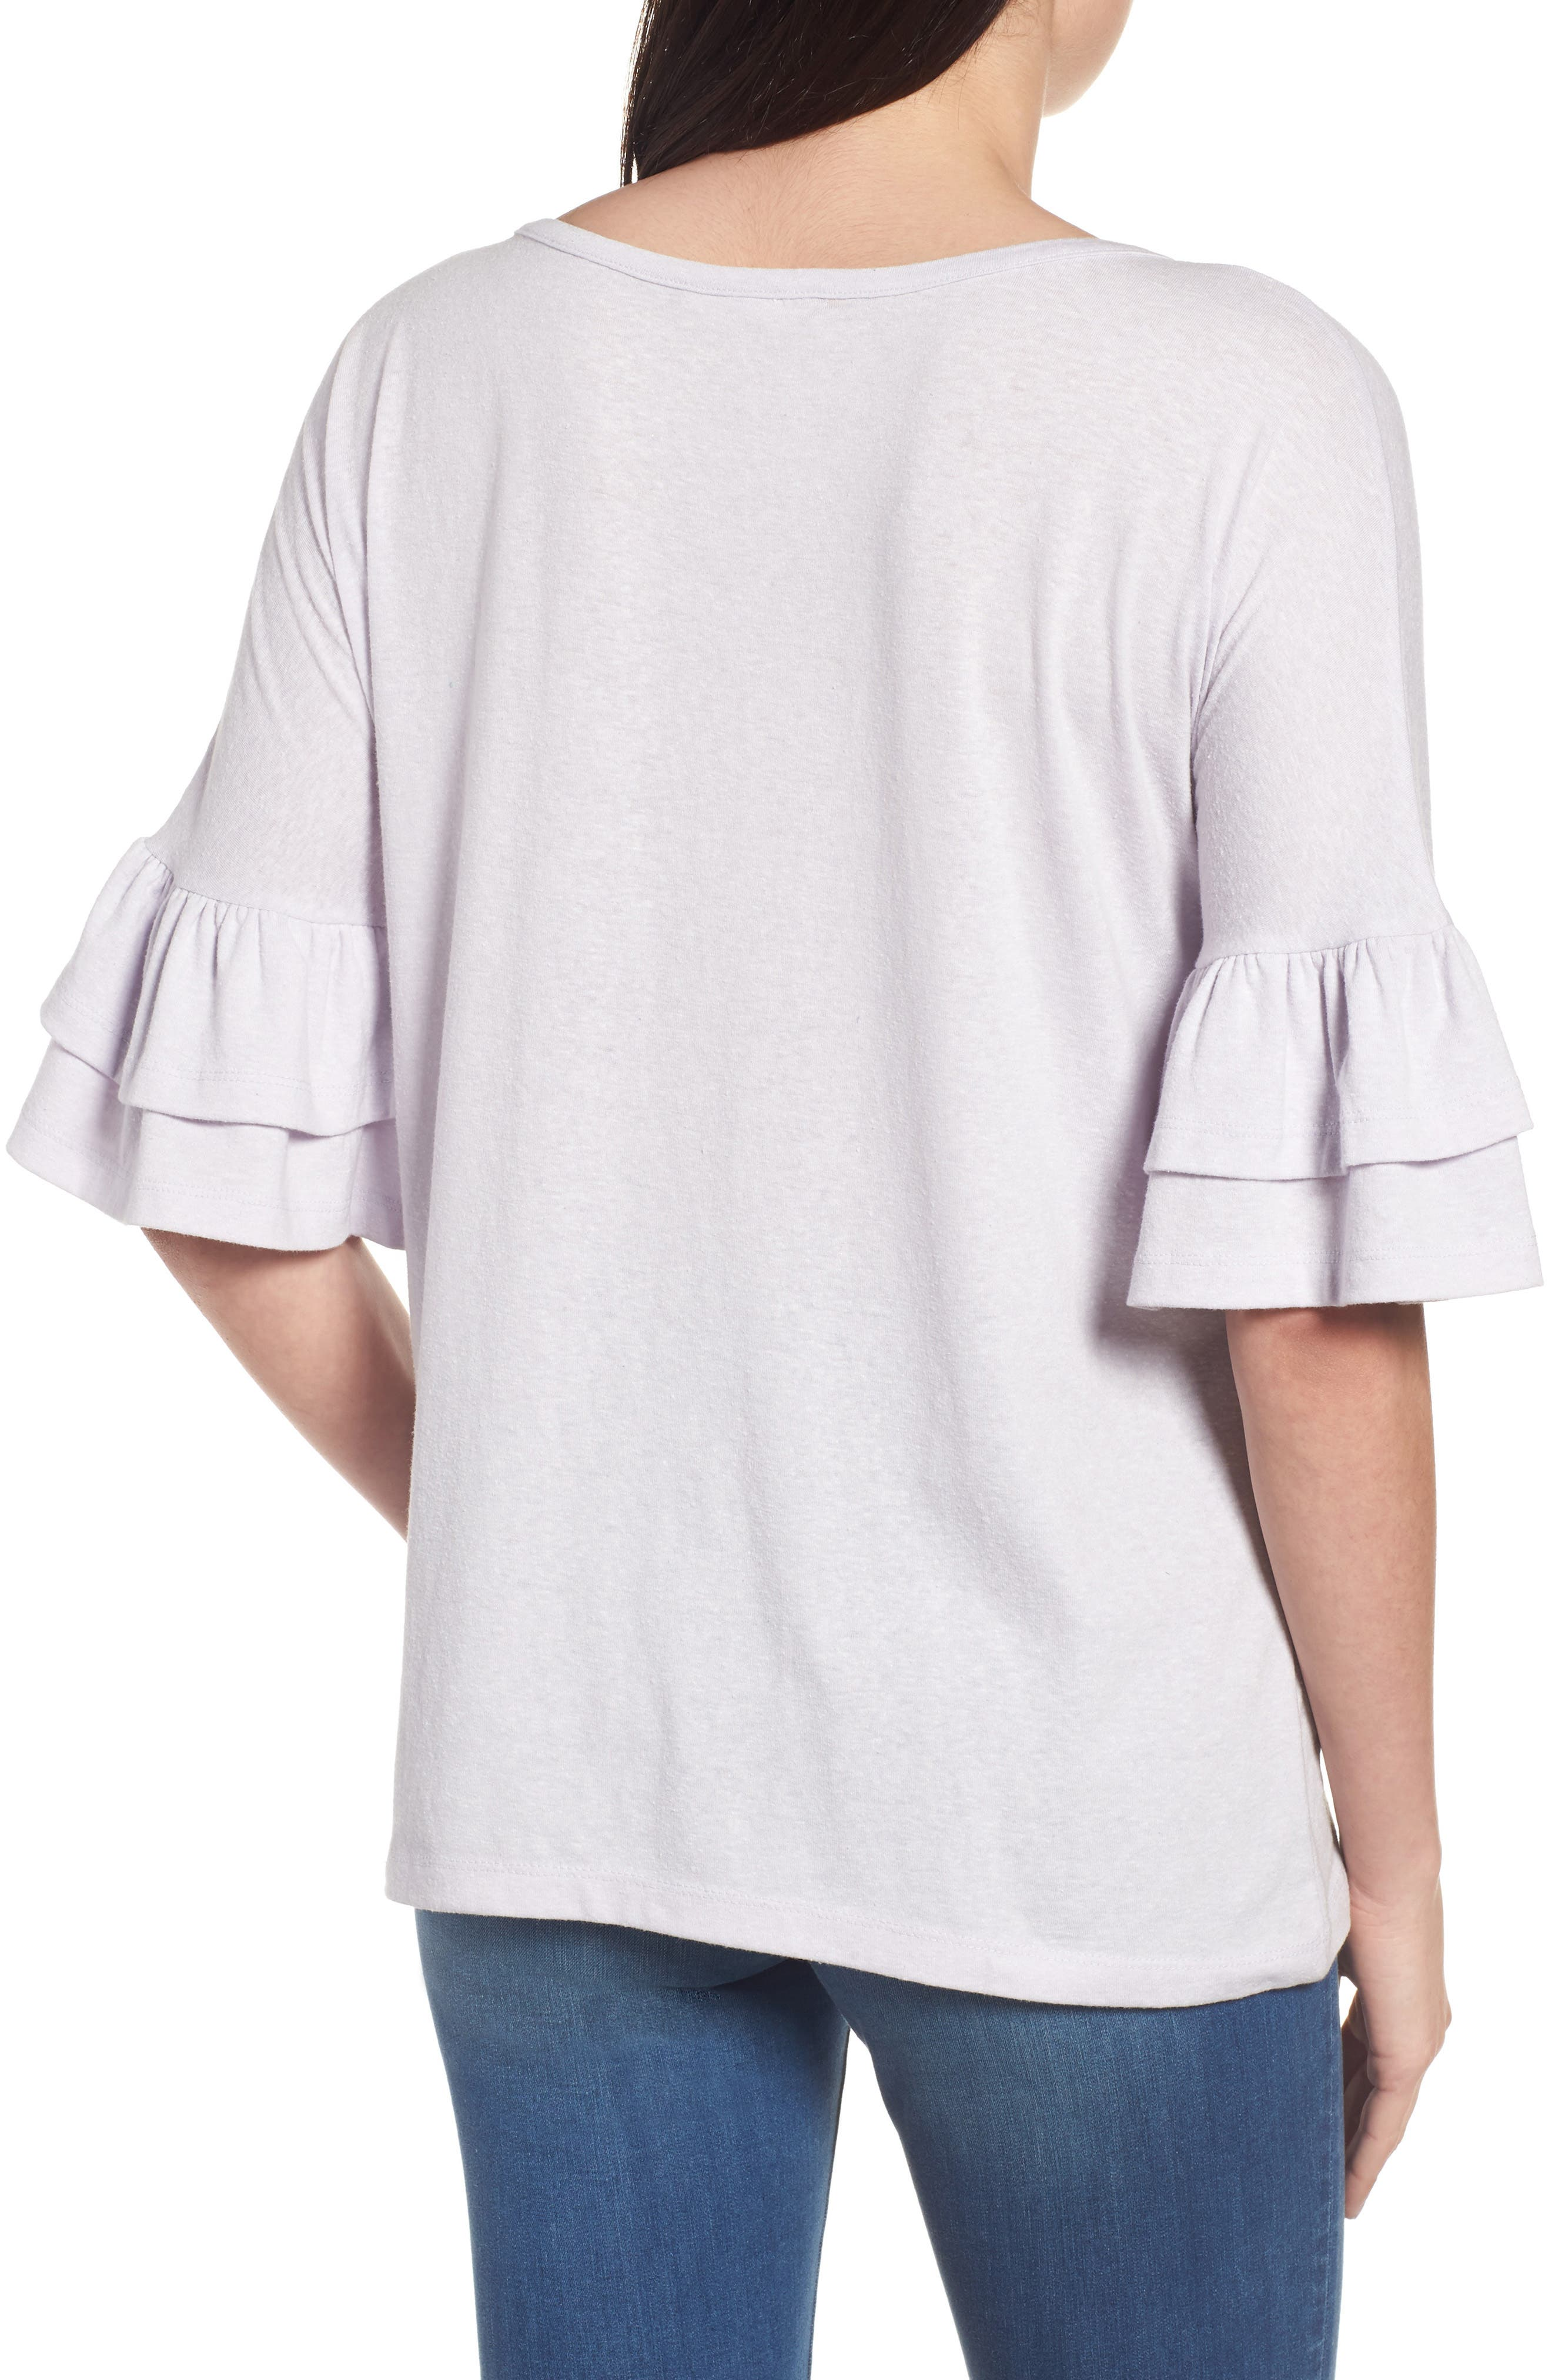 Alternate Image 2  - Caslon® Tiered Bell Sleeve Tee (Regular & Petite)